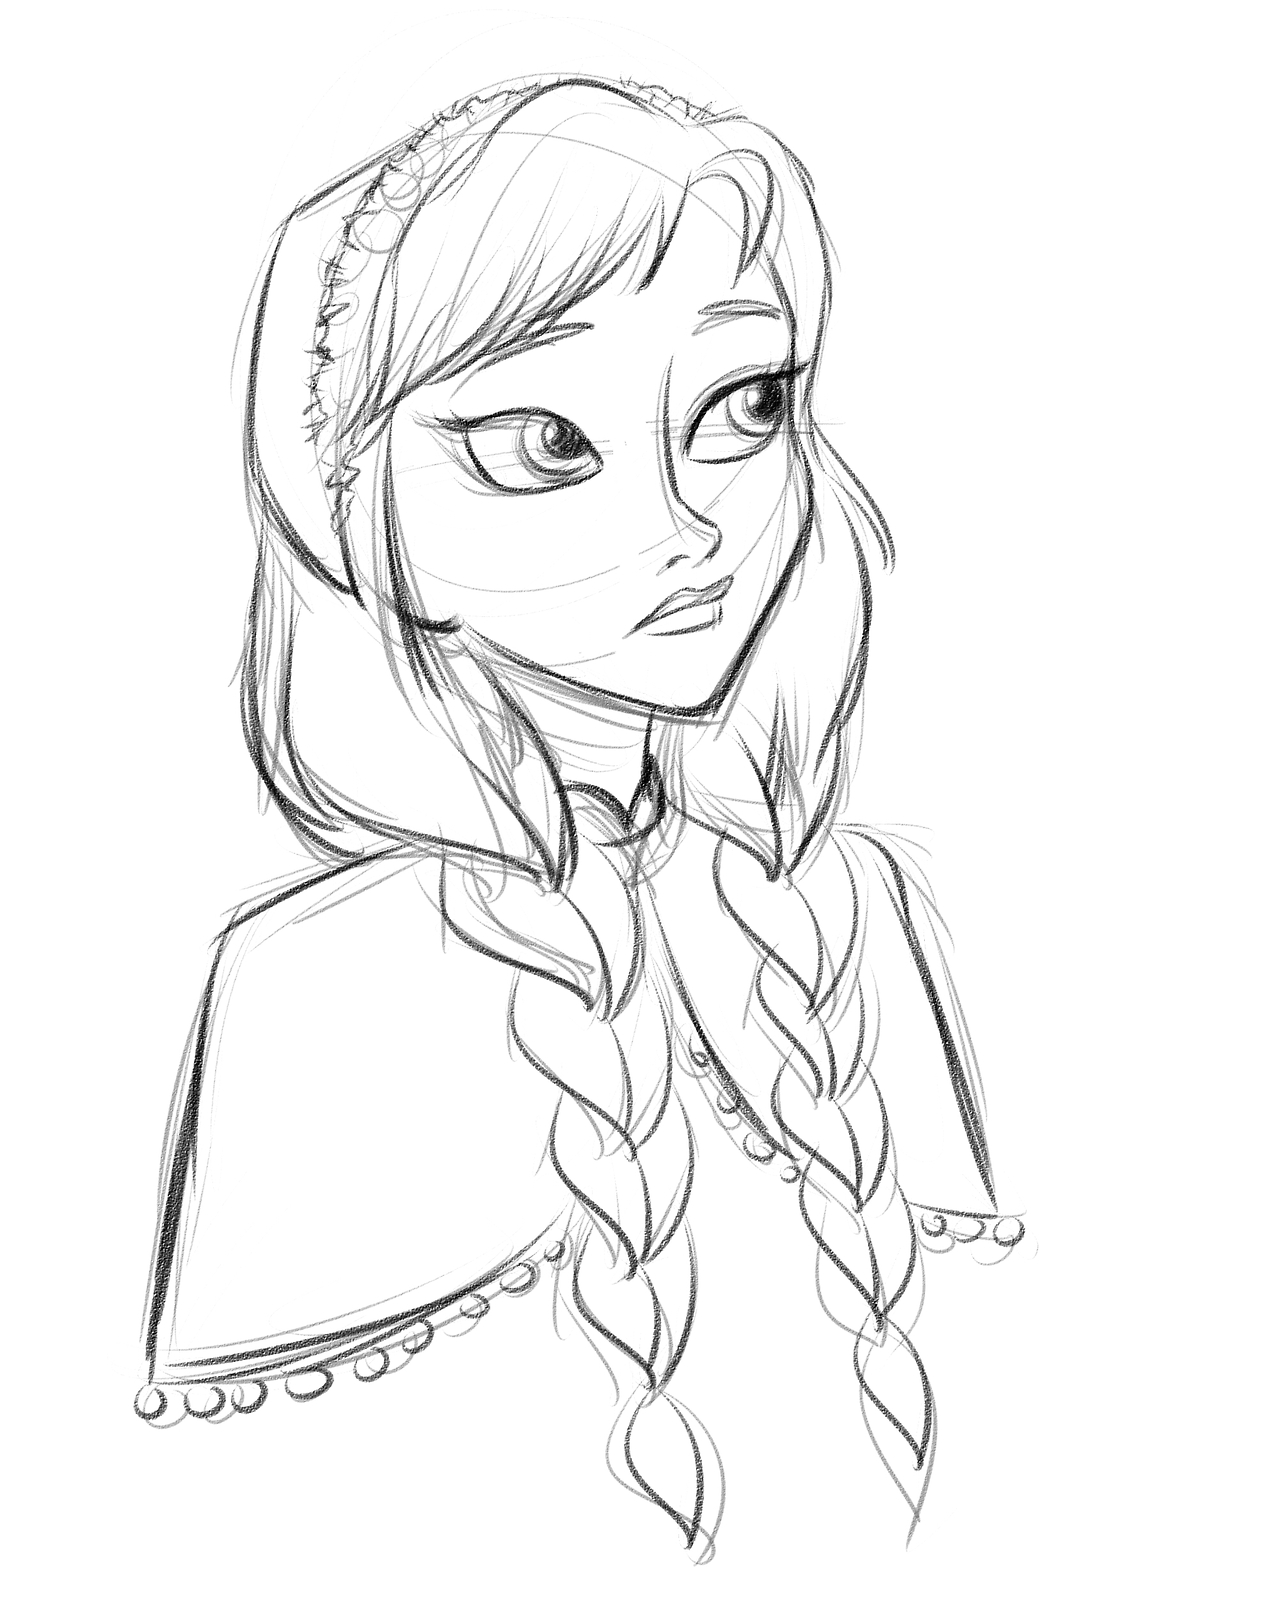 1280x1600 I Did A Doodle. Annamoredaringthangraceful Frozen